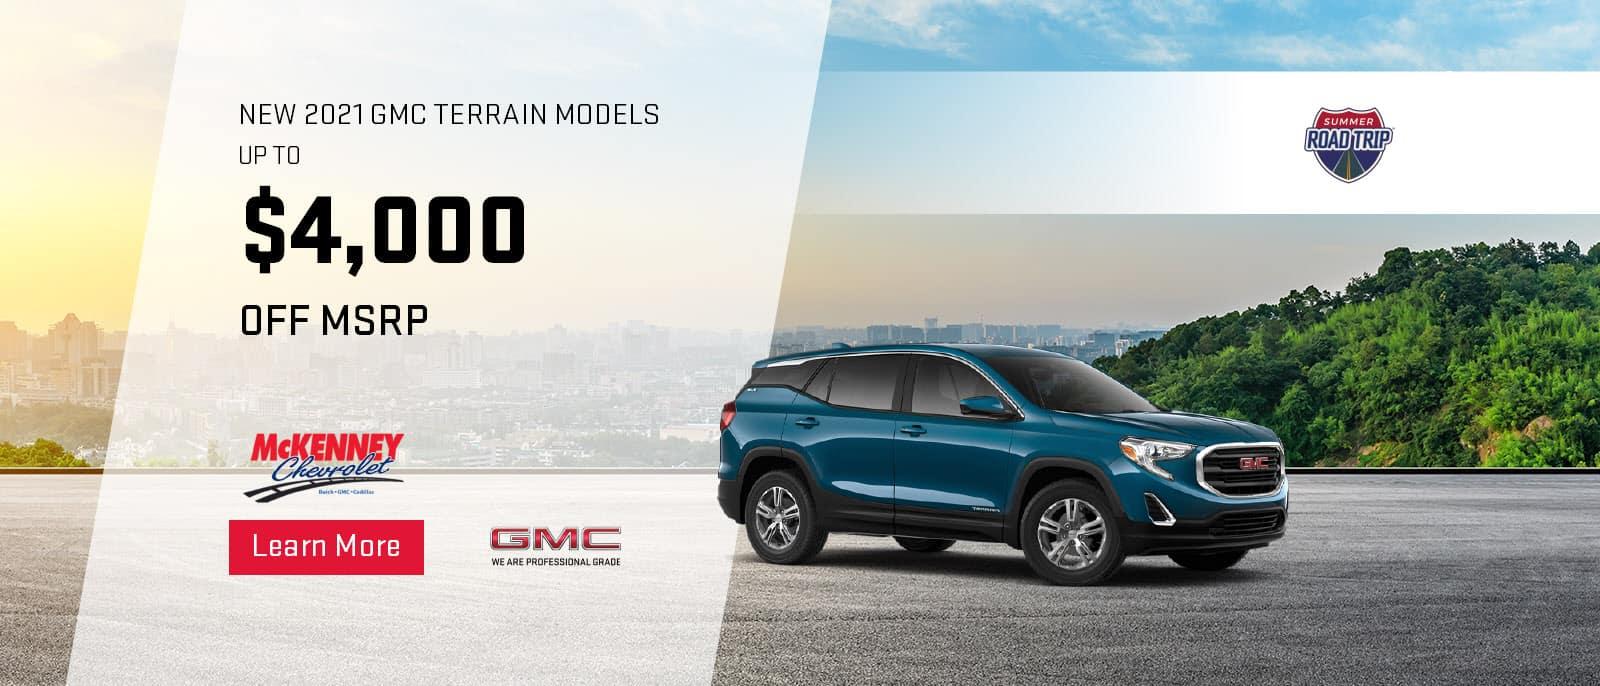 2021 GMC Terrain Models